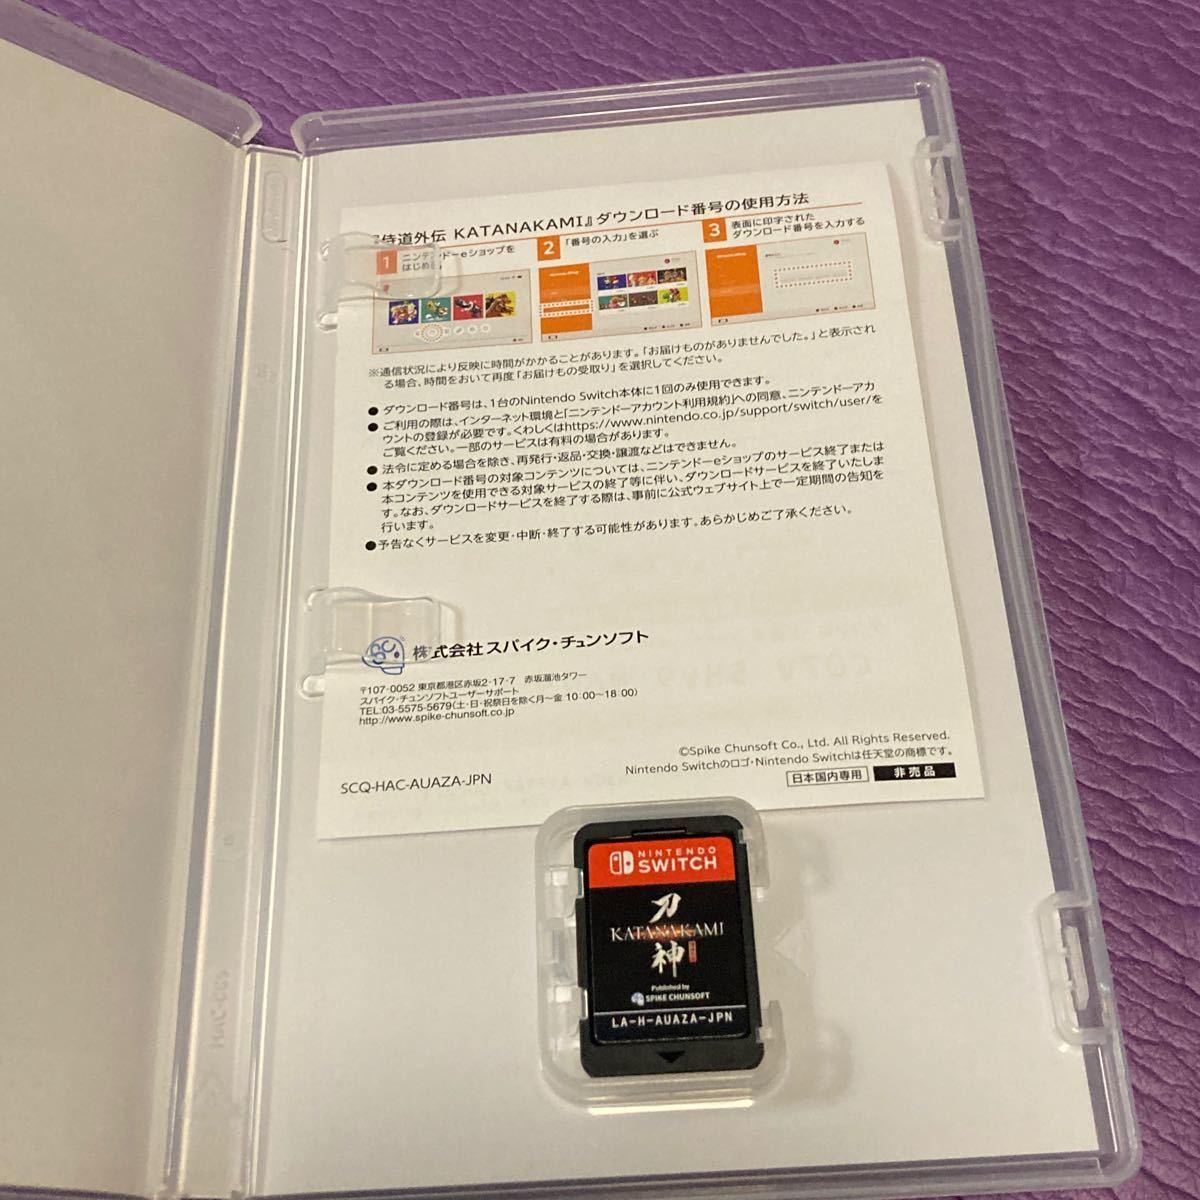 switch  侍道外伝 KATANAKAMI 刀神 中古  任天堂Switch Nintendo ニンテンドースイッチ